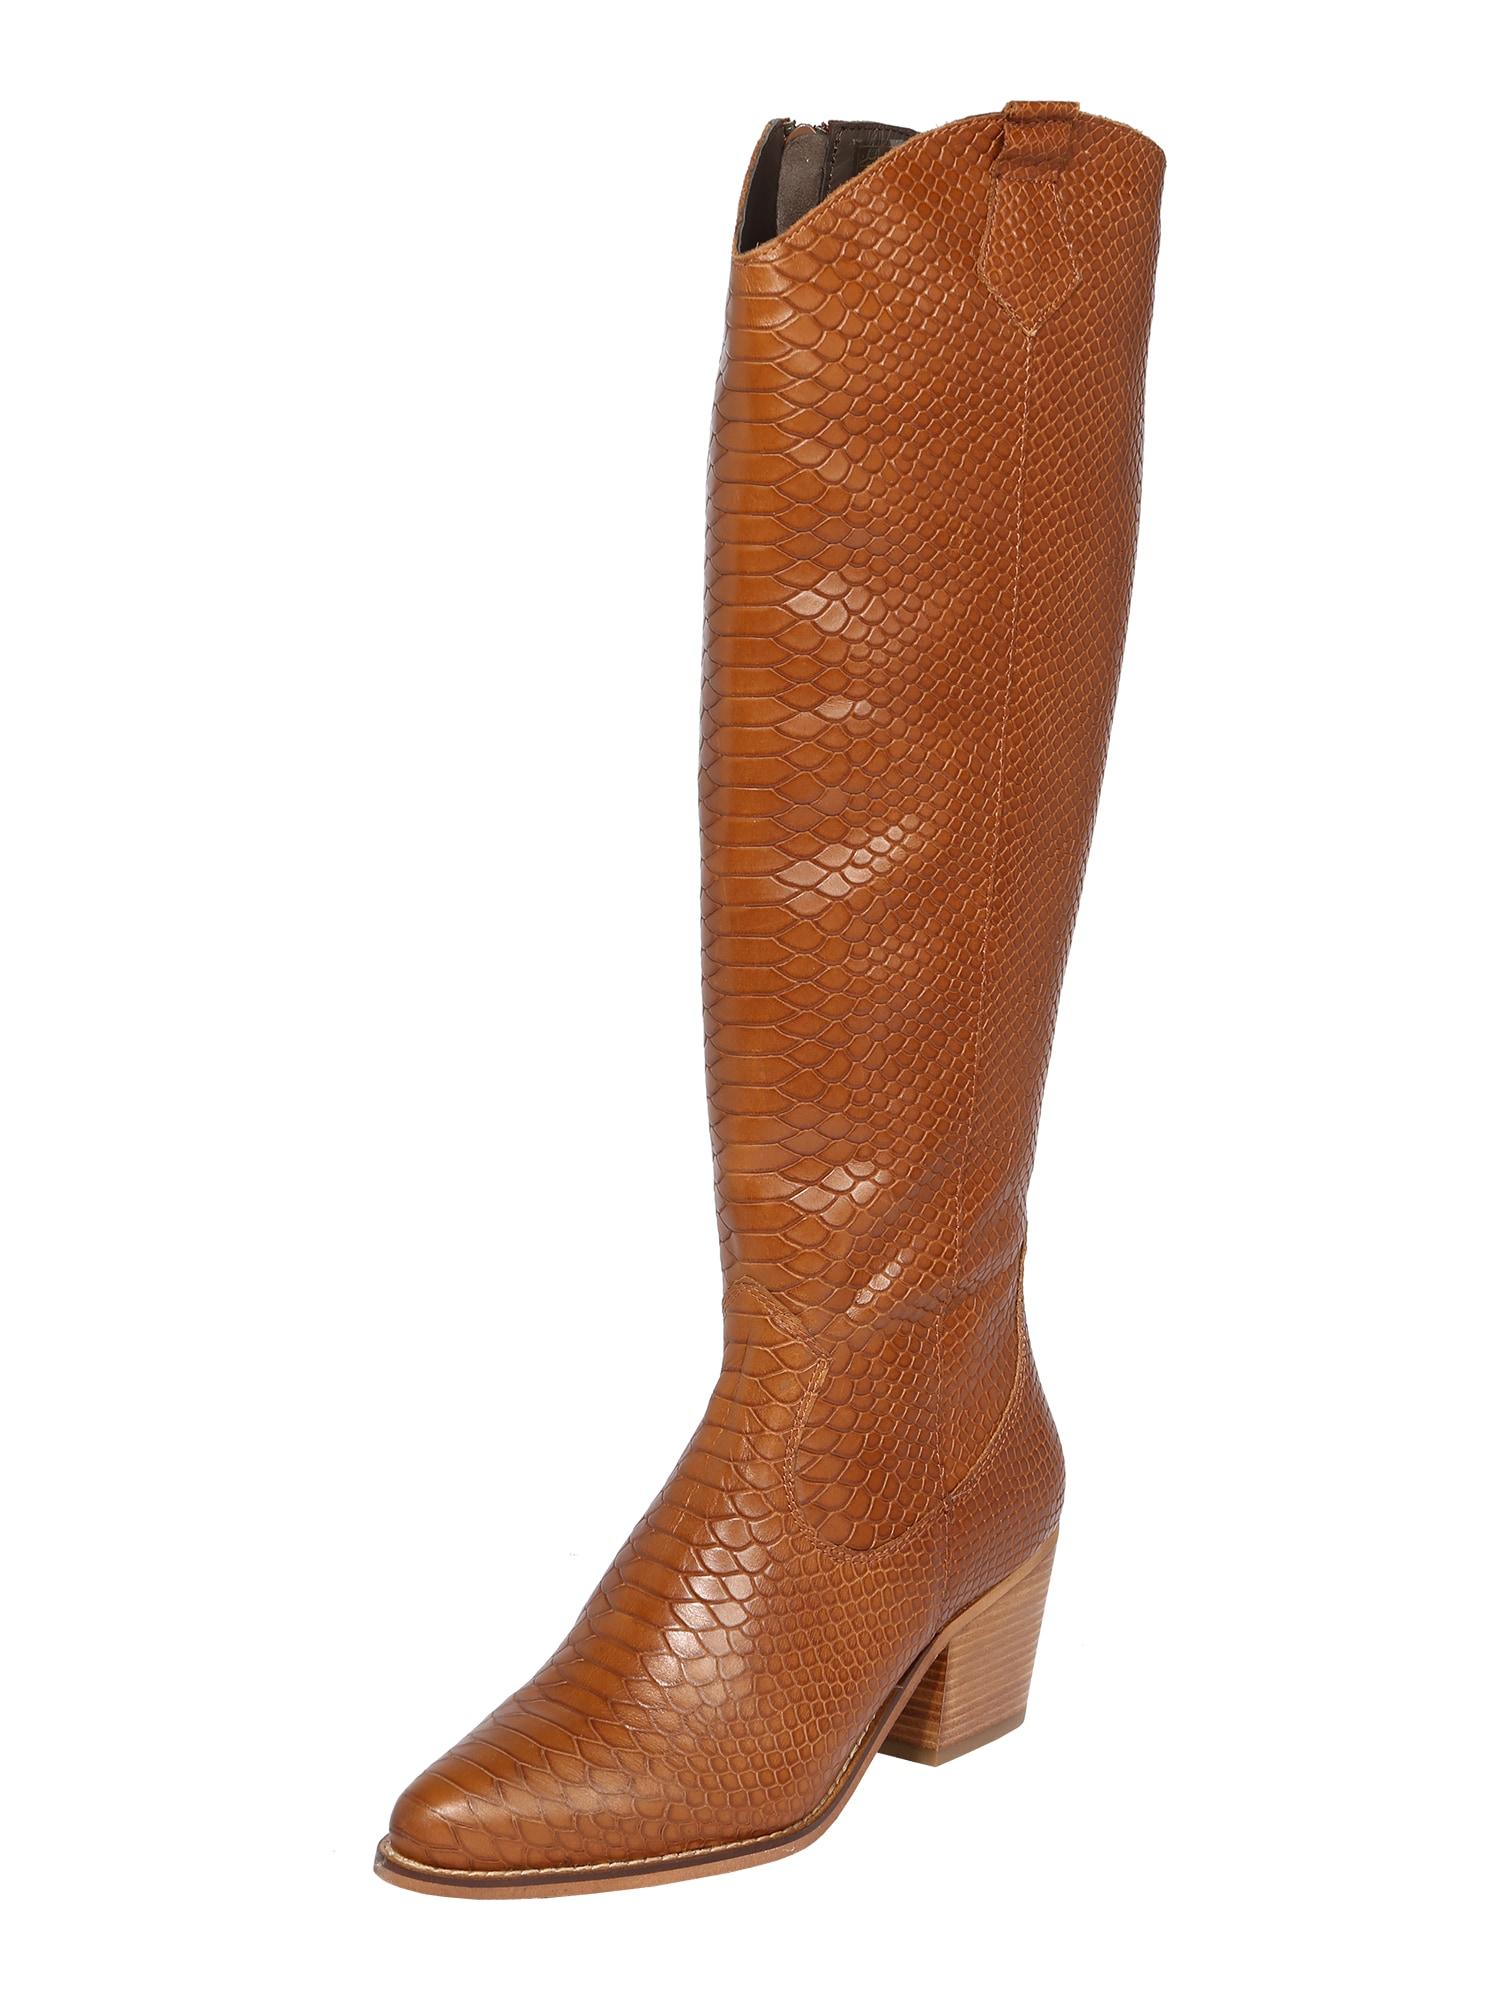 PS Poelman Kaubojiški batai ruda (konjako)